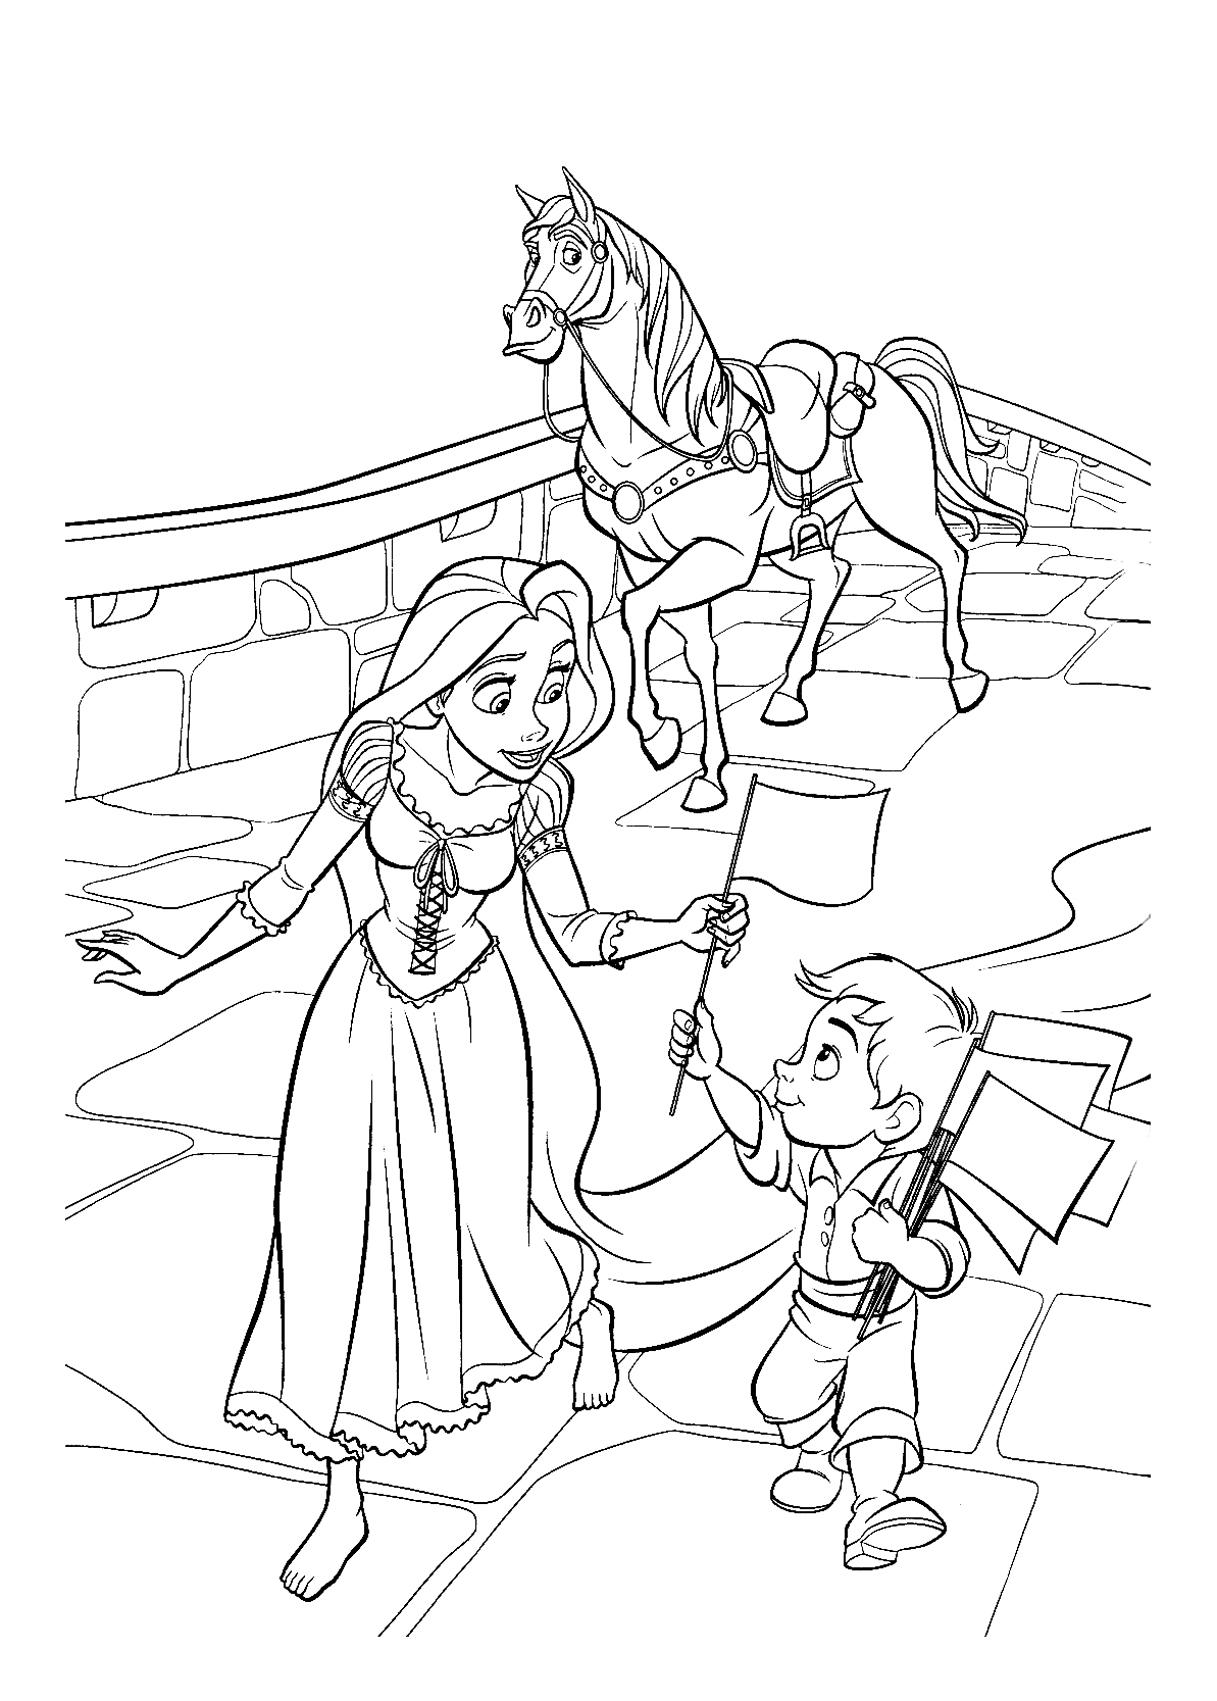 Dessin colorier cheval maximus - Maximus cheval raiponce ...